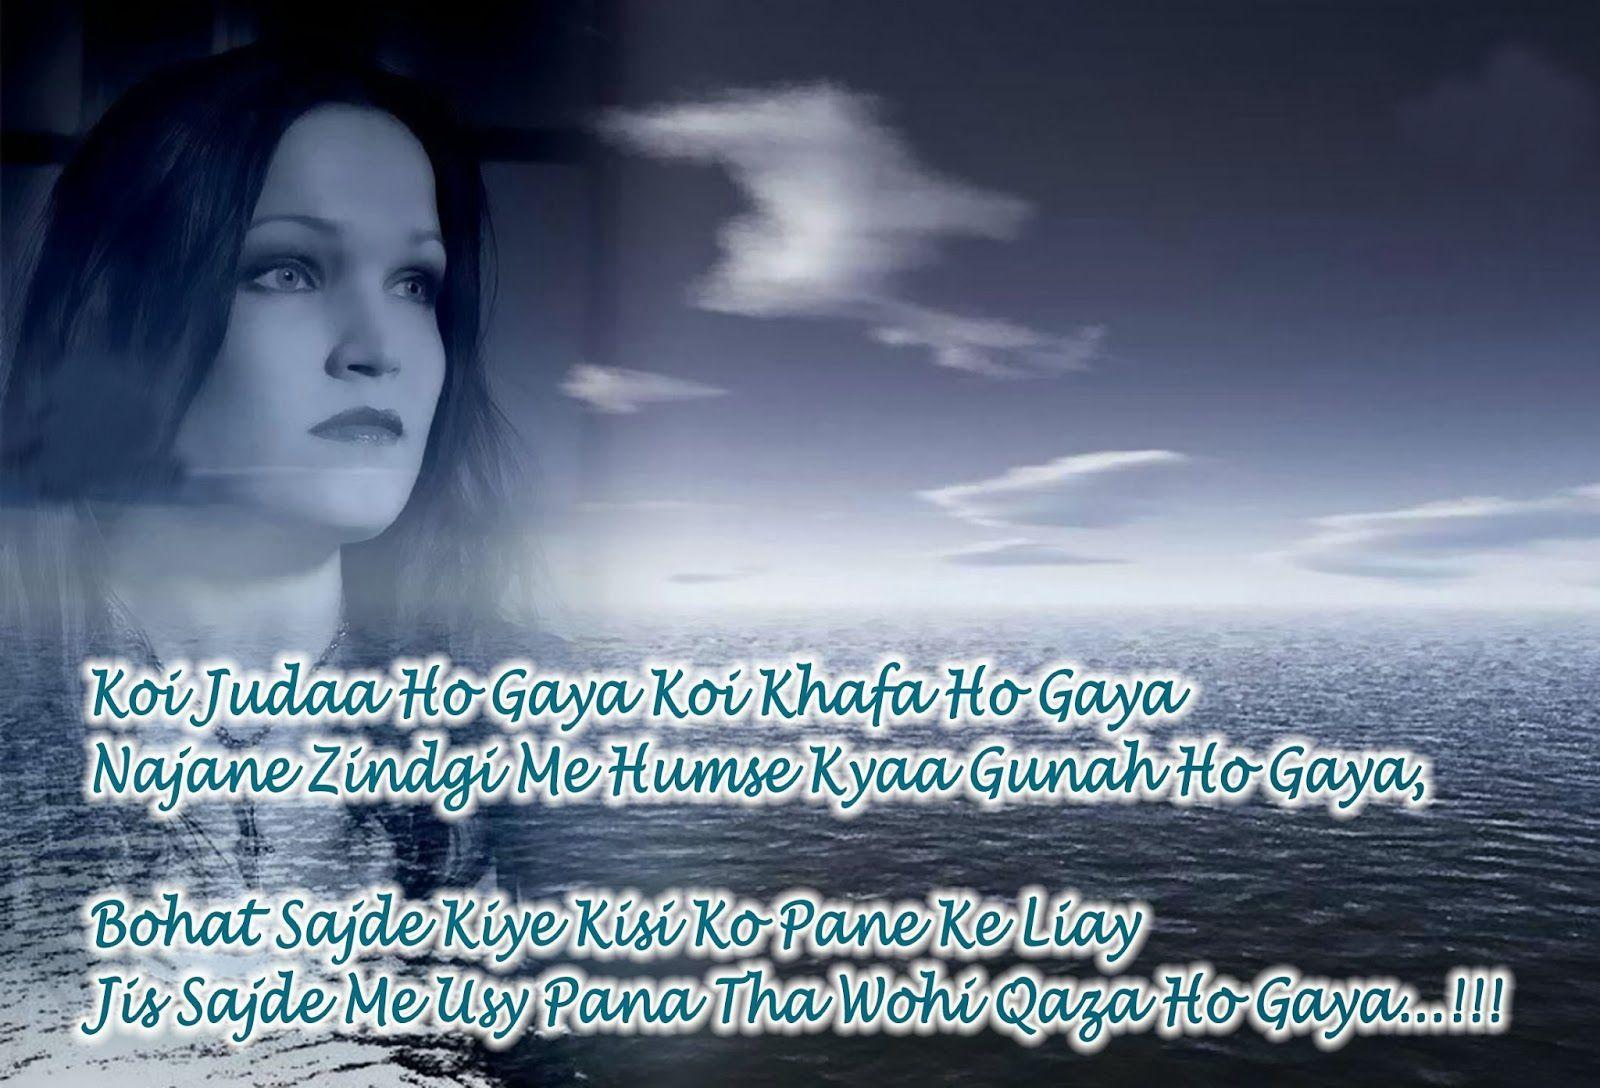 Shayri In English Google Search Quotes T English: Download Wallpaper Of Love Shayari Hd HD